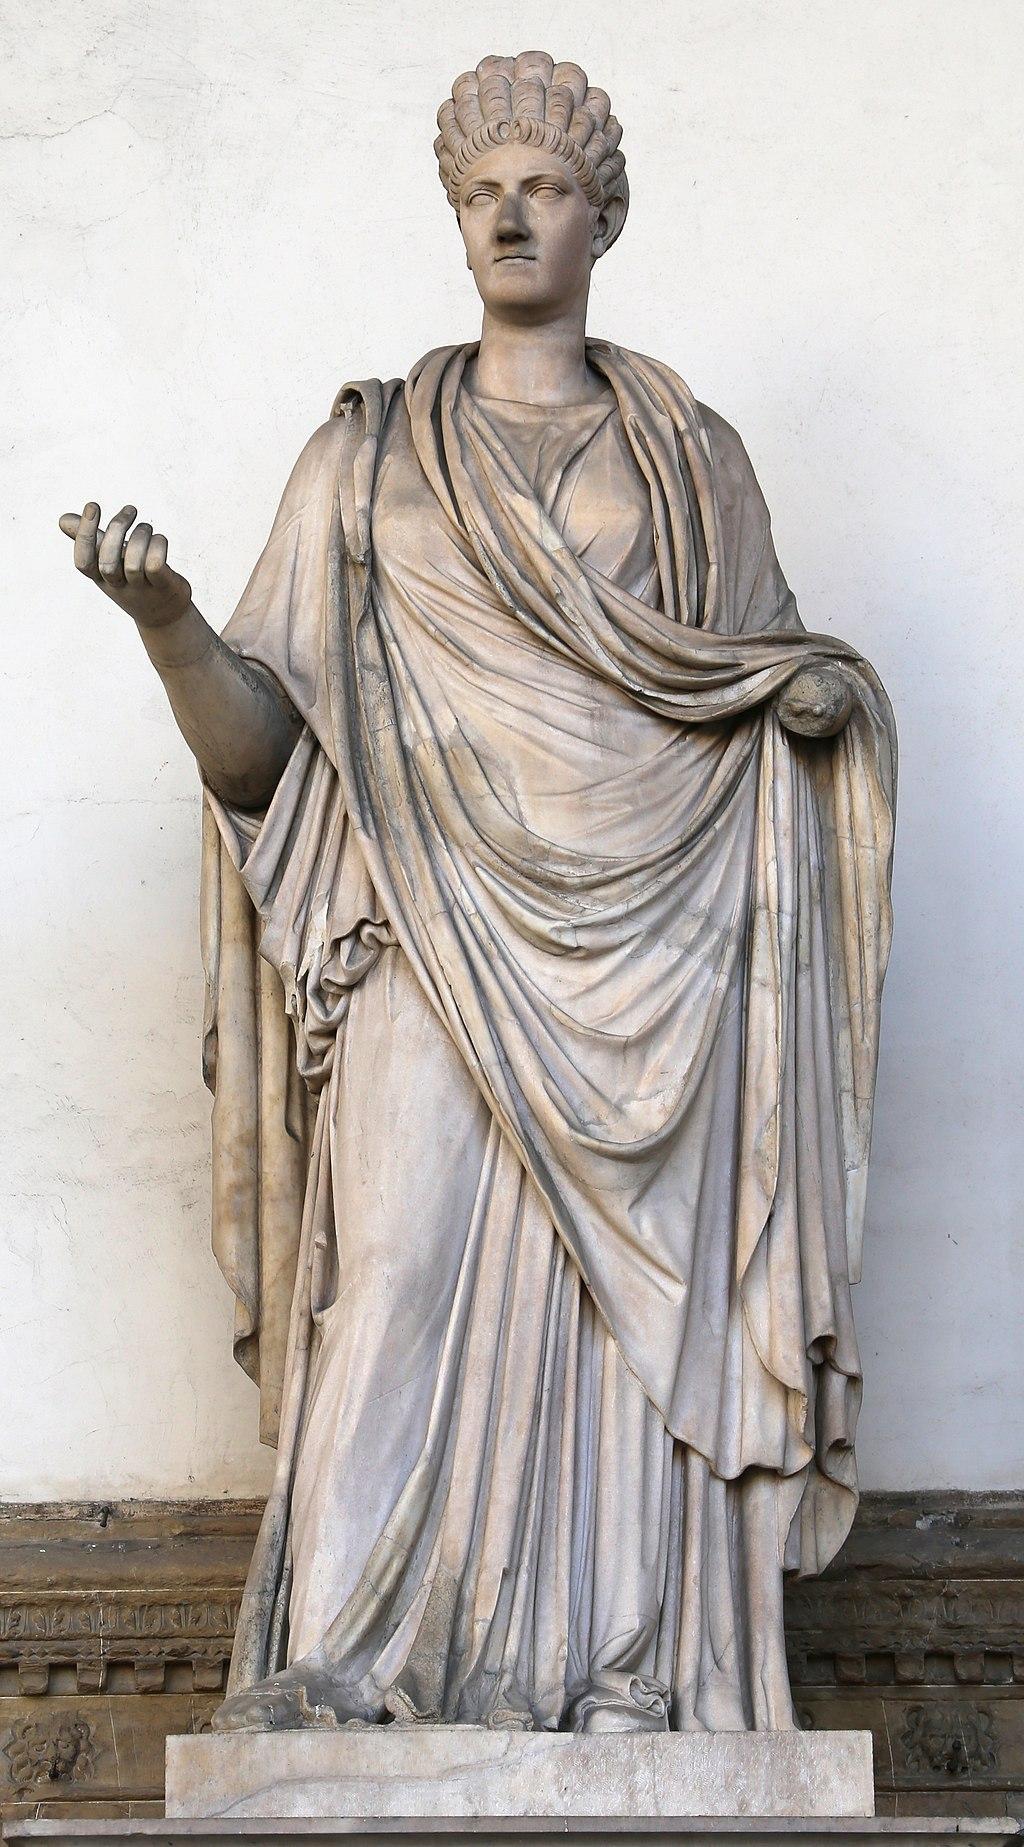 Arte romana, Ulpia Marciana (48 AD - 112 AD) elder sister of Roman Emperor Trajan